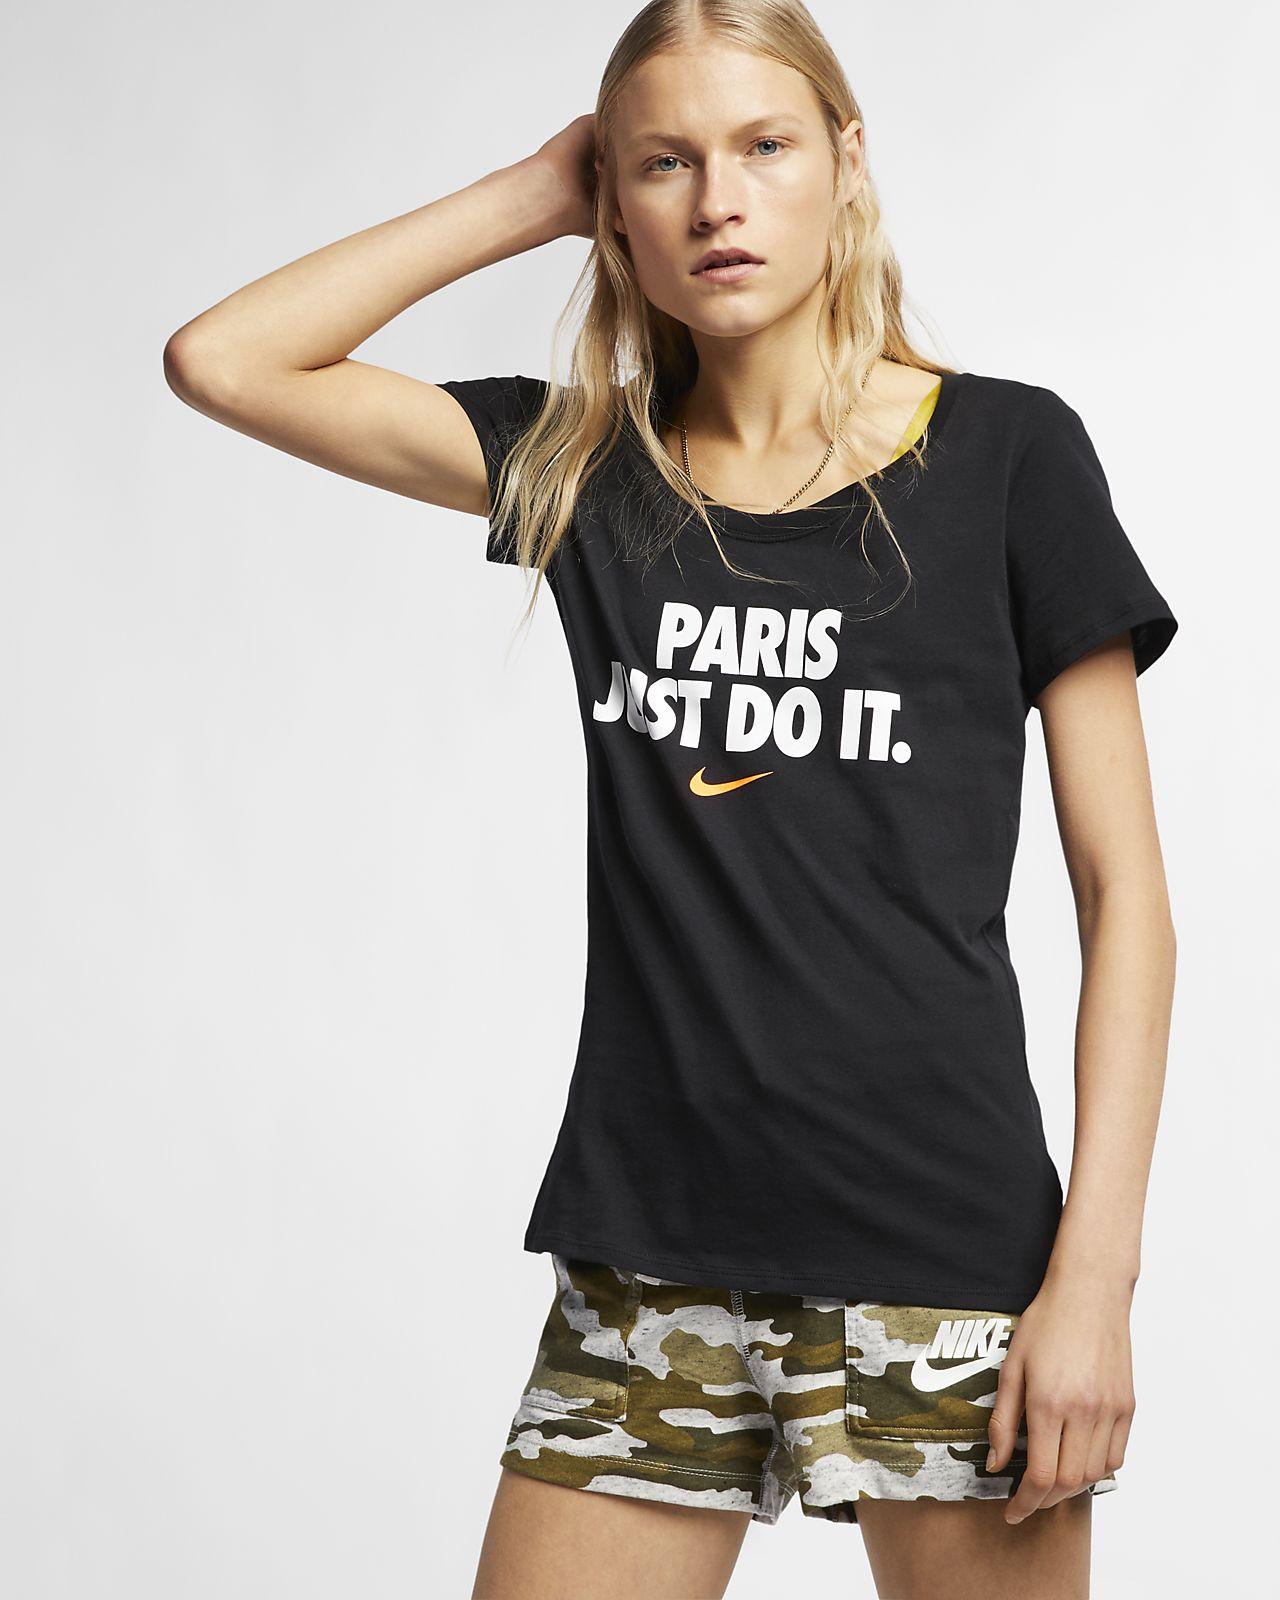 Nike City (Paris) Women's T-Shirt